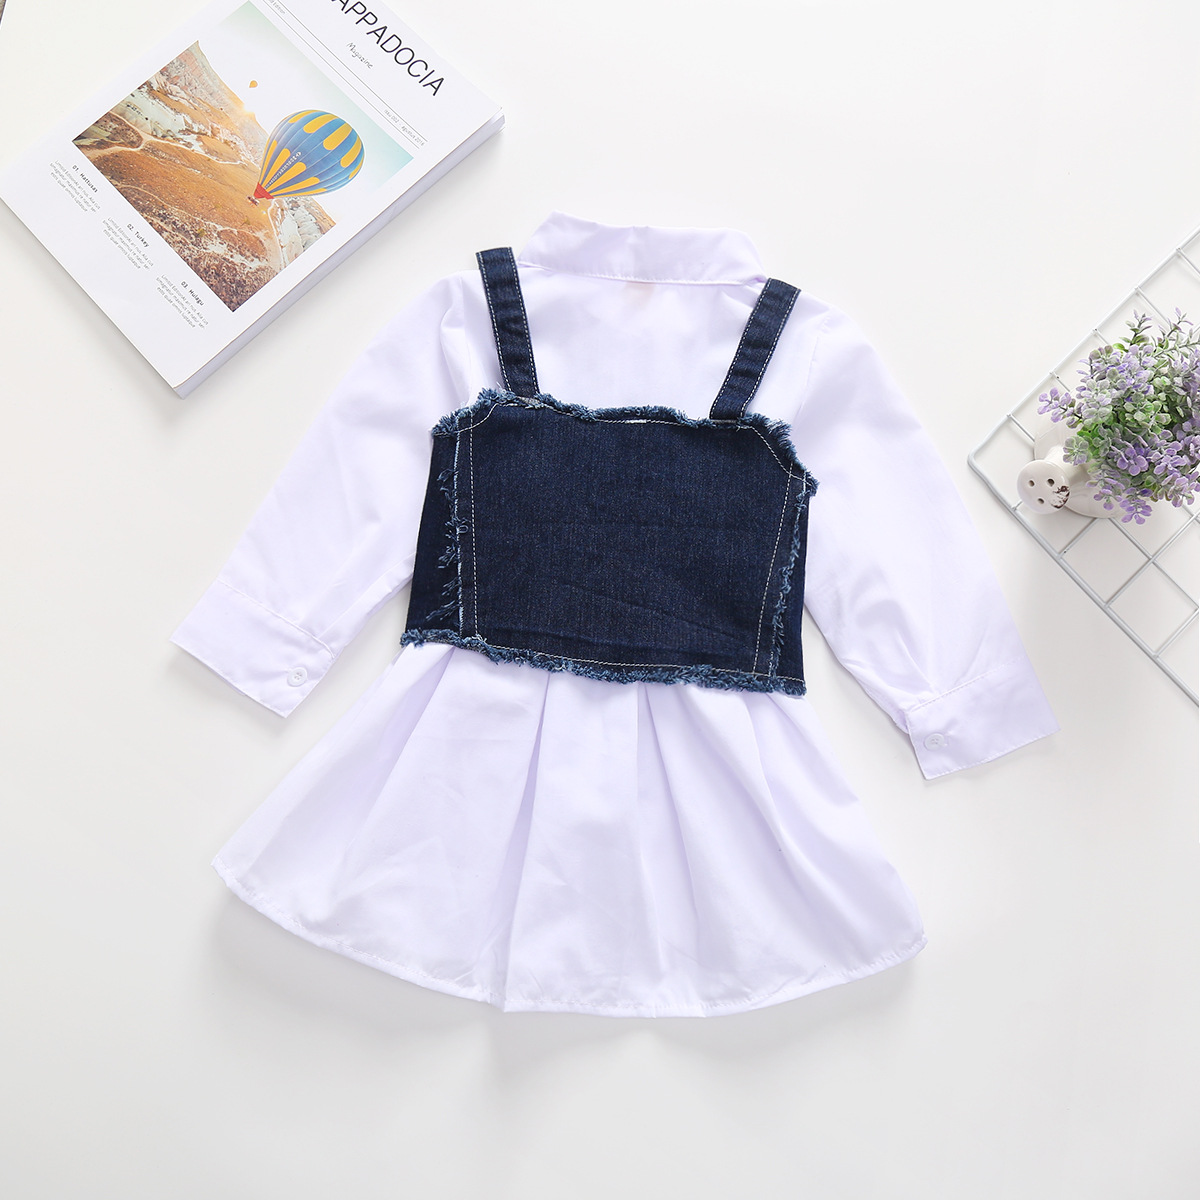 Girls Solid Color Fold-down Collar Long-Sleeve Shirt Dress L3.31 1